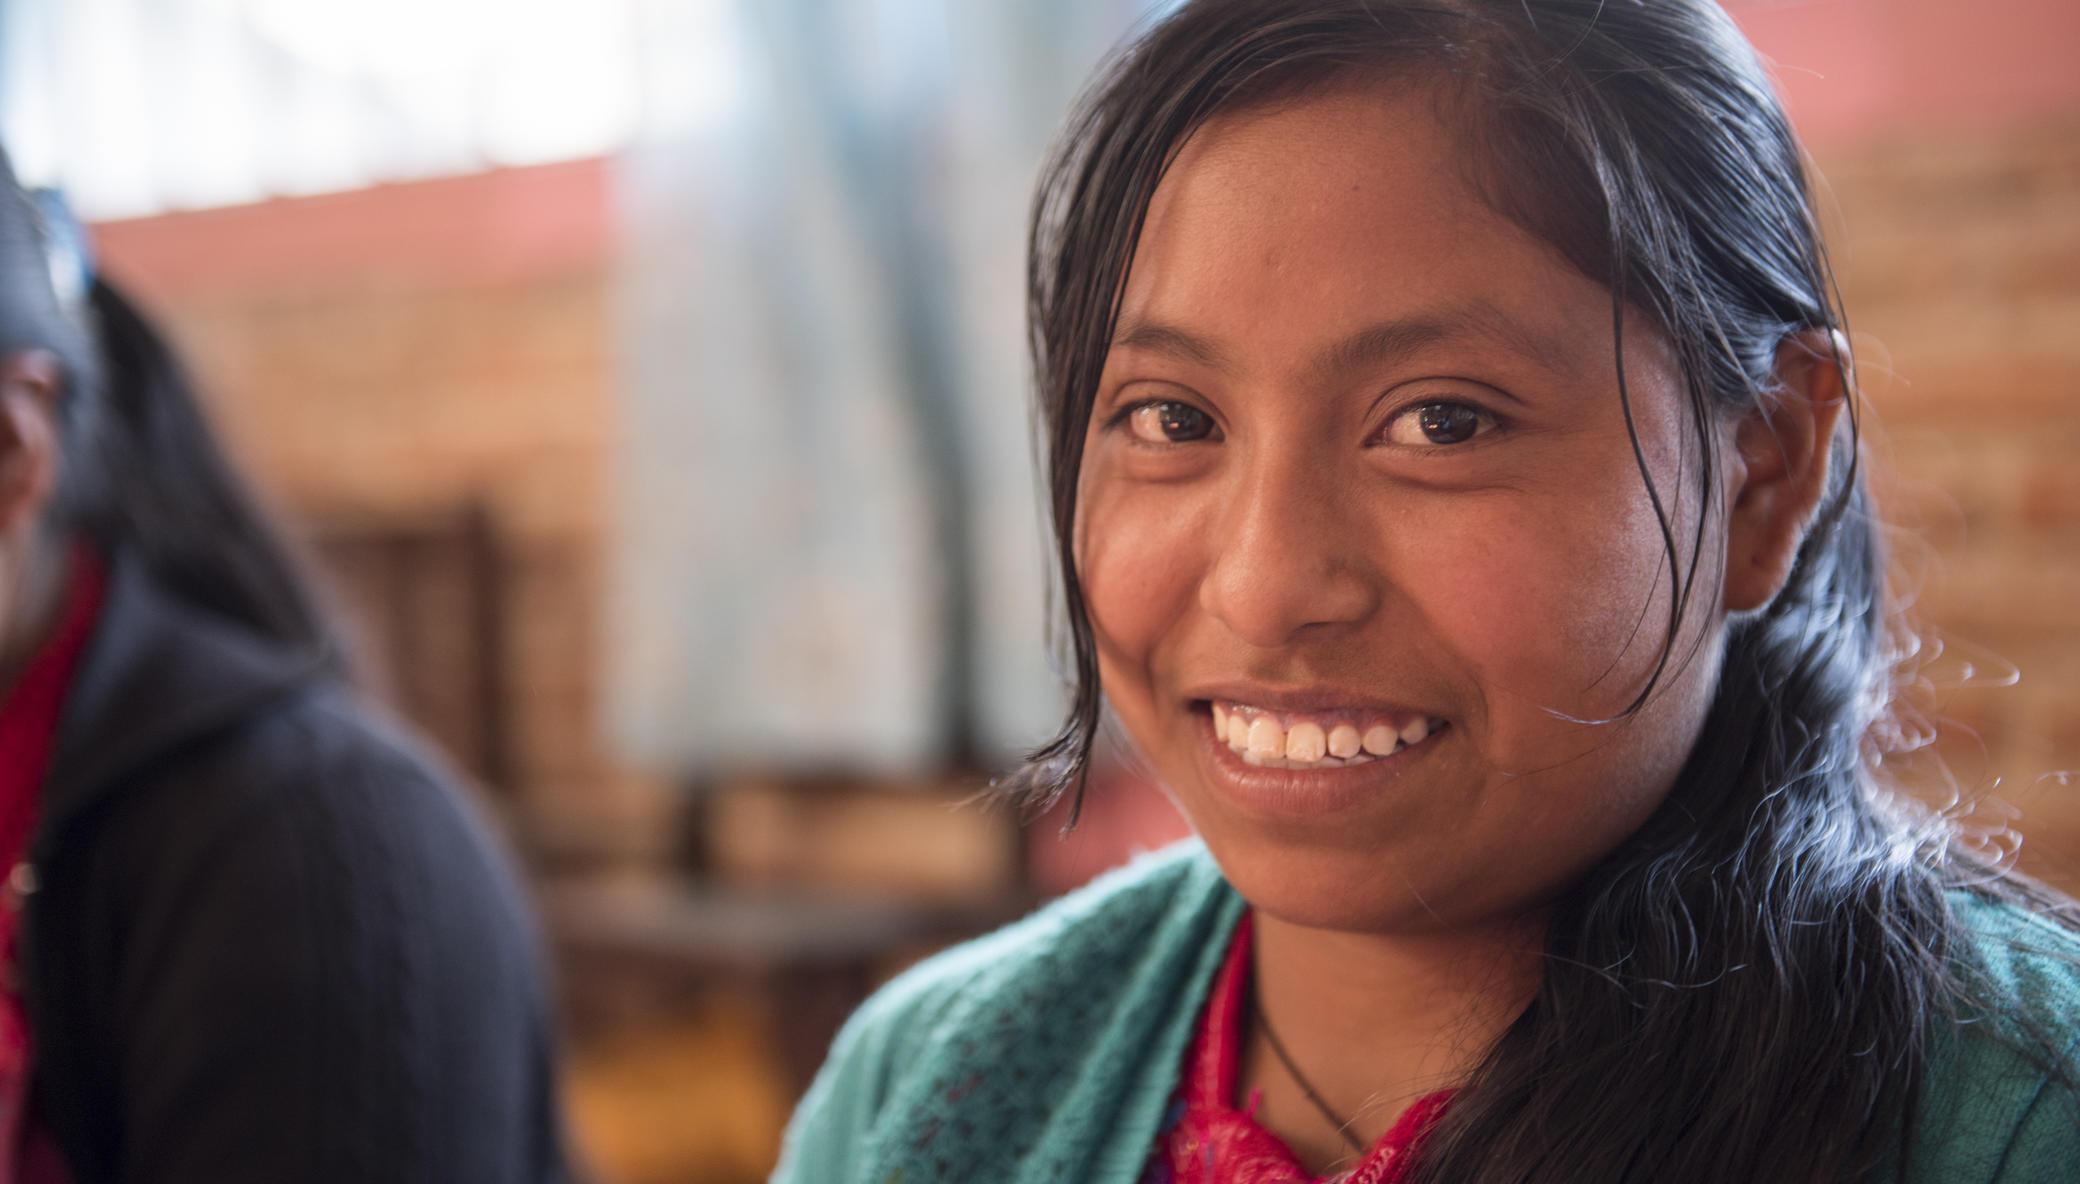 Pathways to autonomy: tzotzil women's empowerment